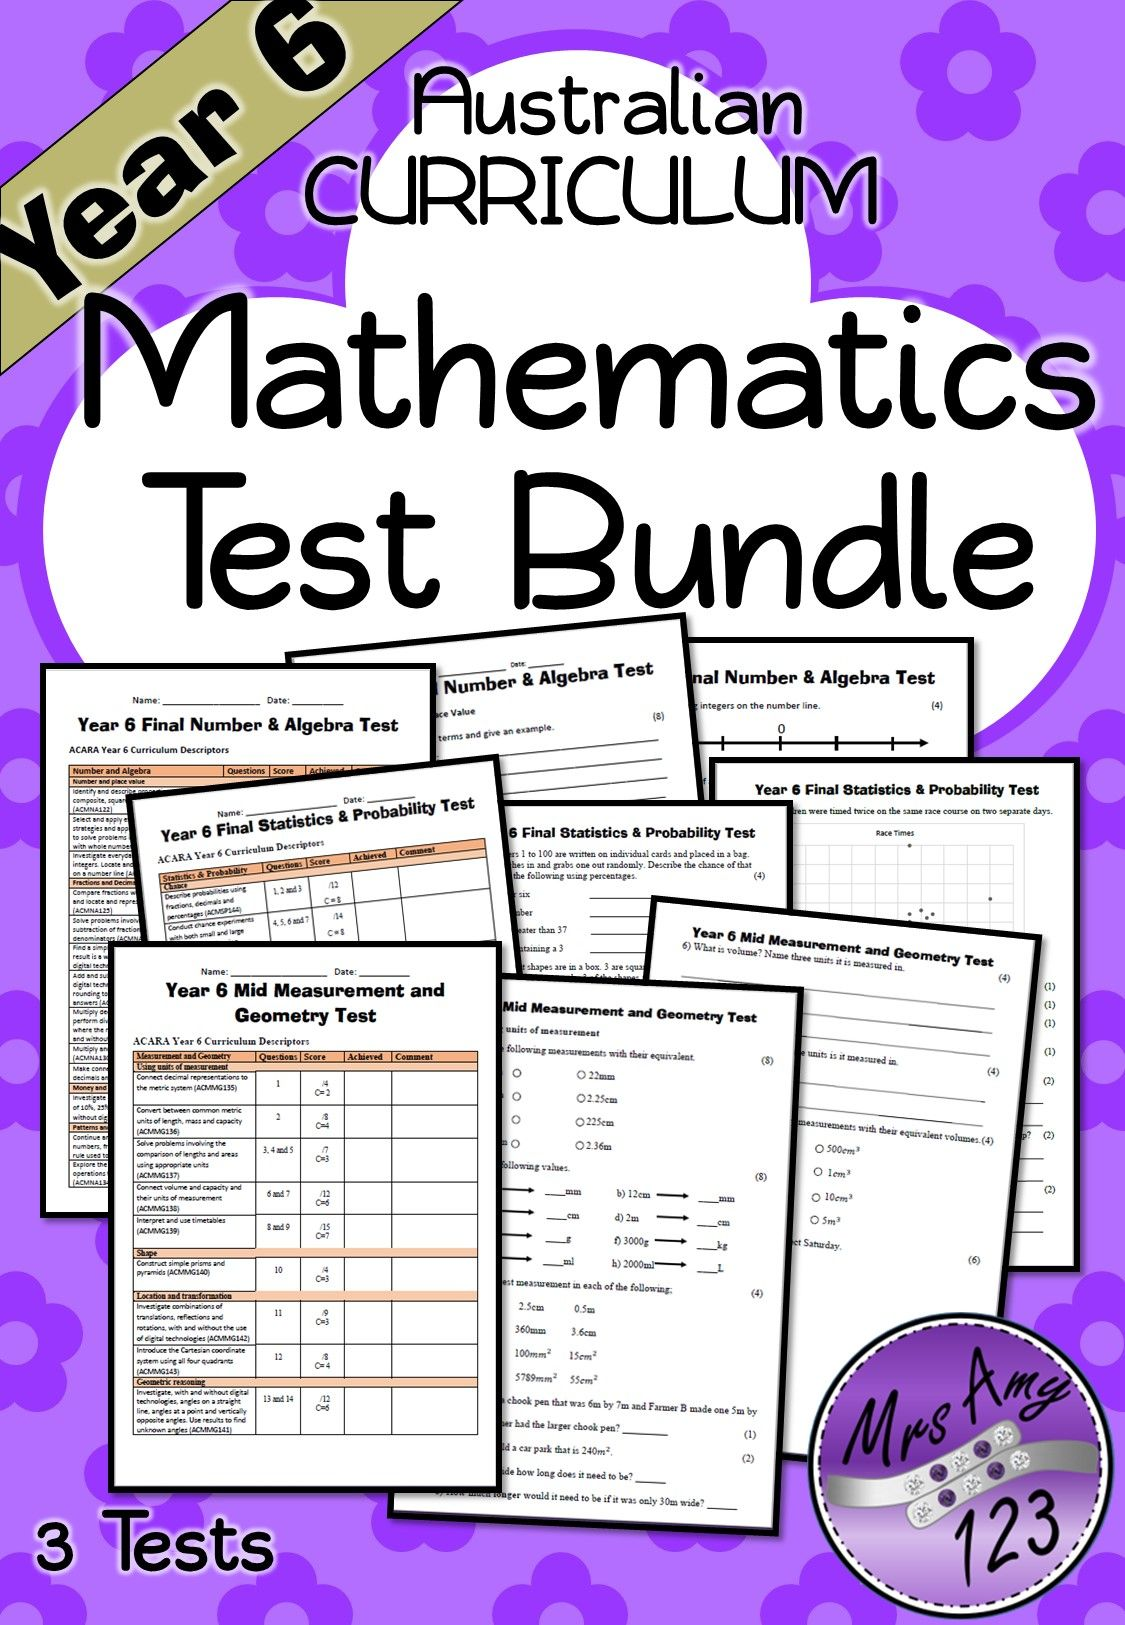 Year 6 Mathematics Test Bundle